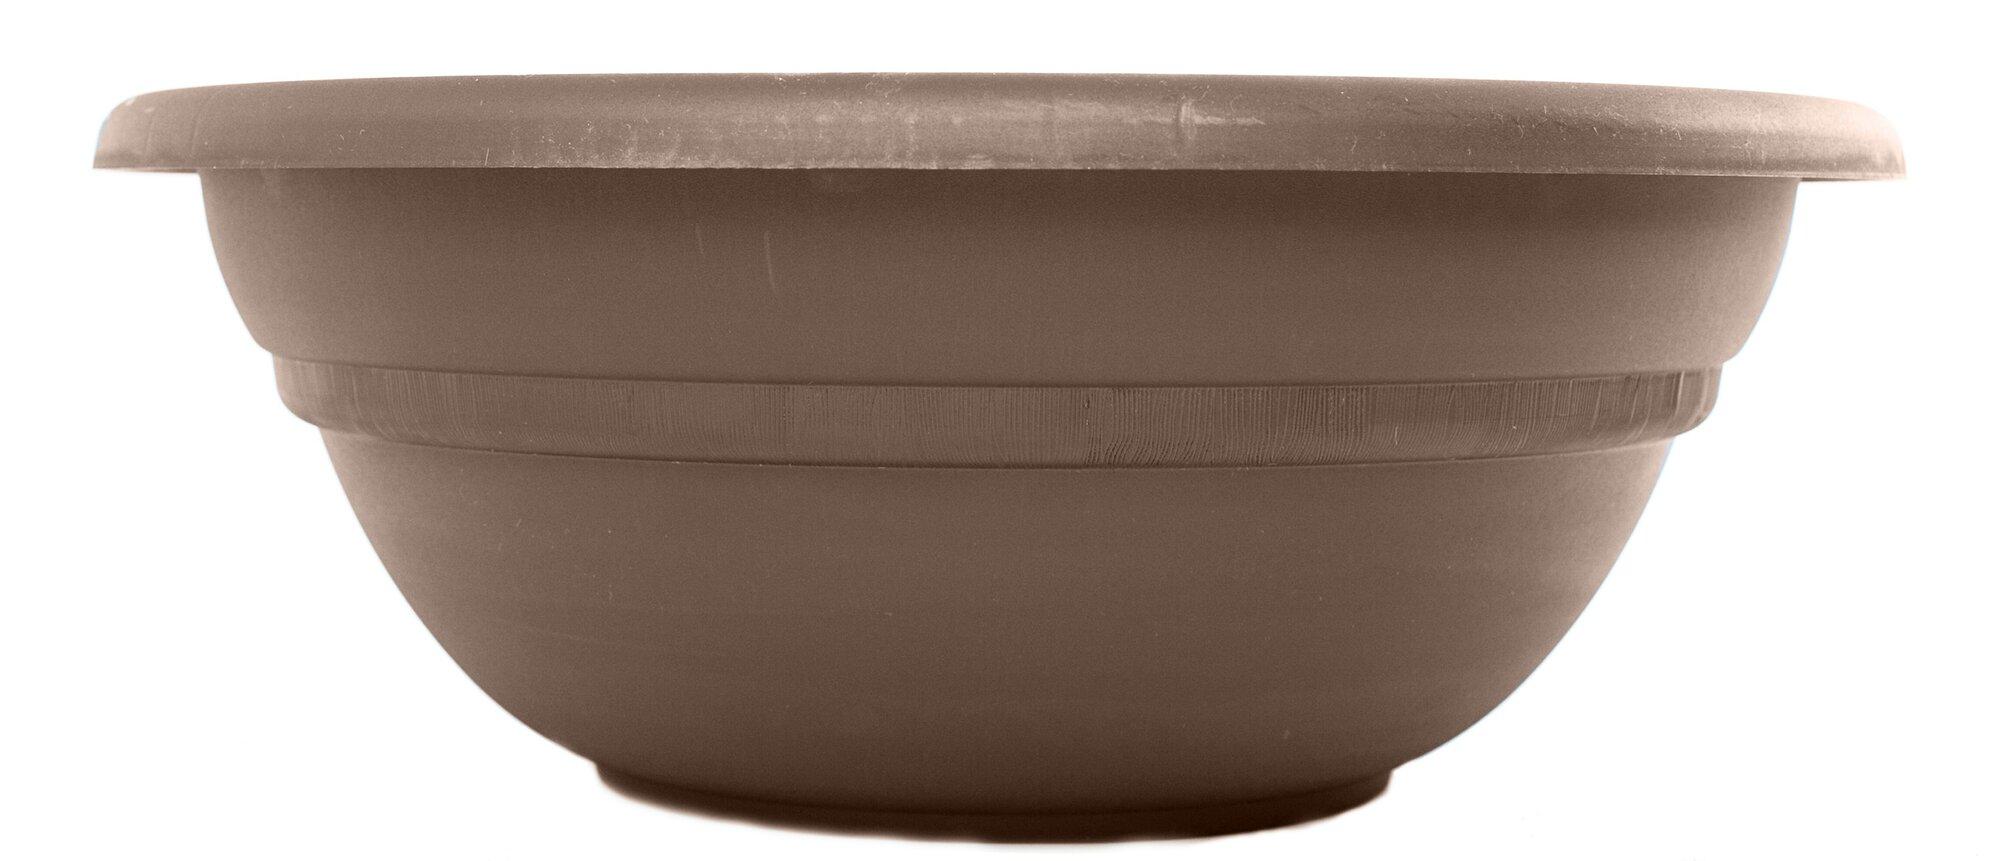 bowl planter pride garden products esteras. Black Bedroom Furniture Sets. Home Design Ideas